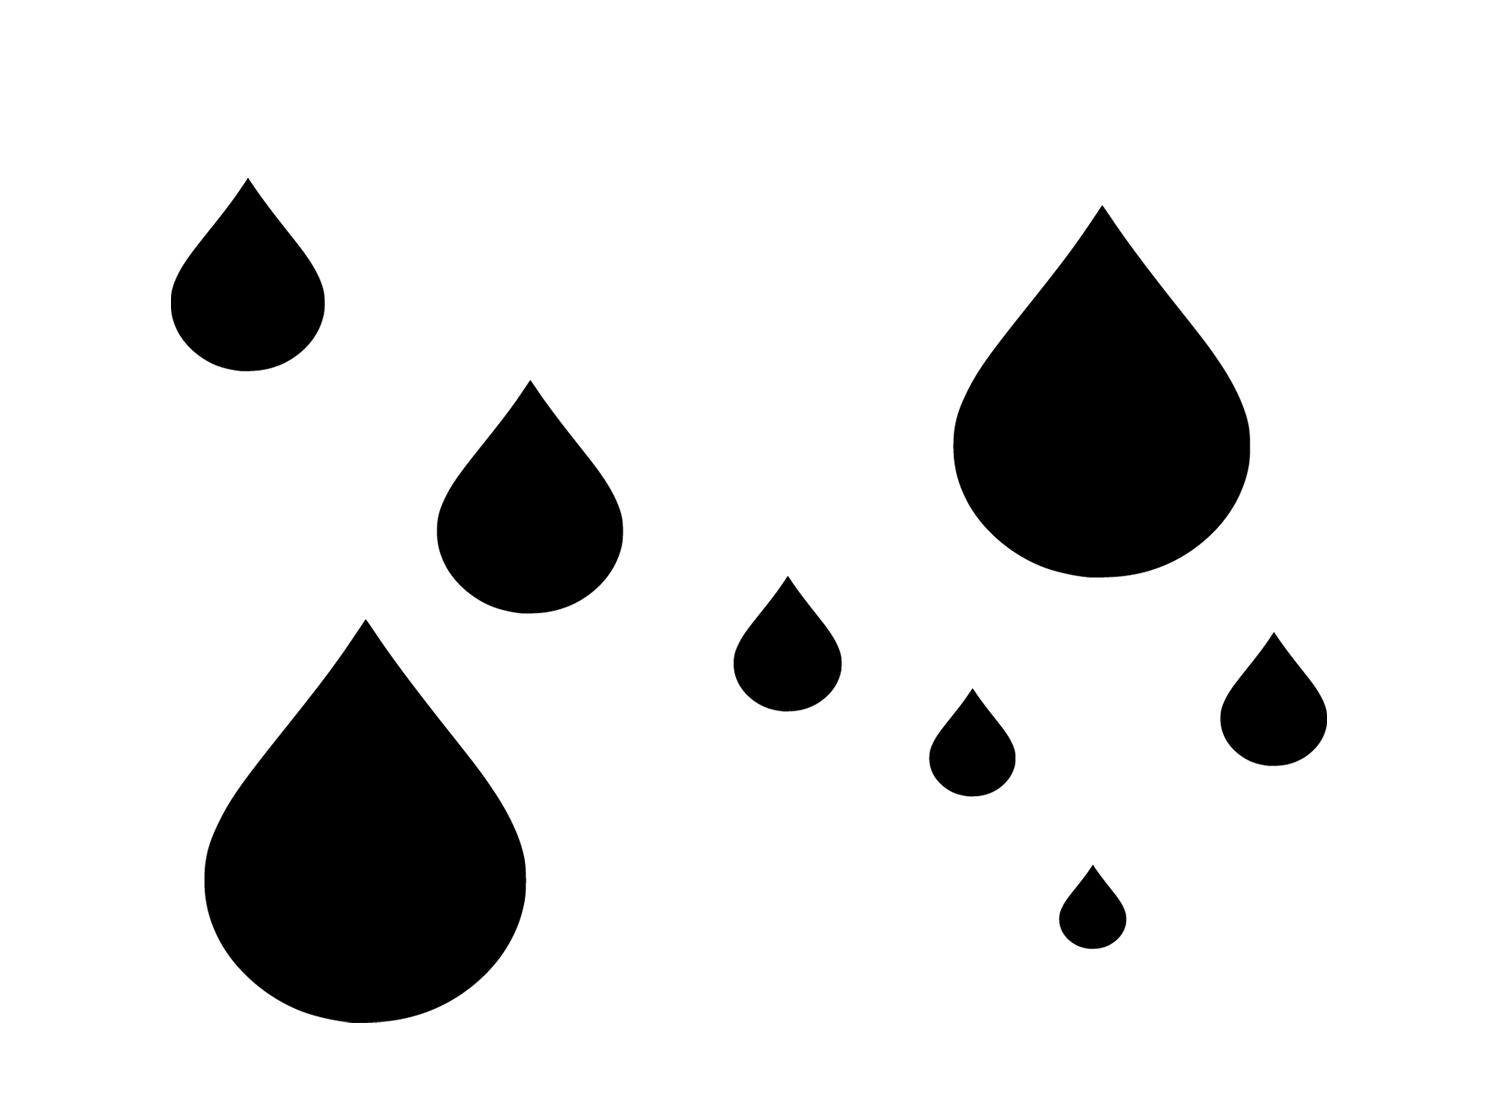 Raindrop template clipart